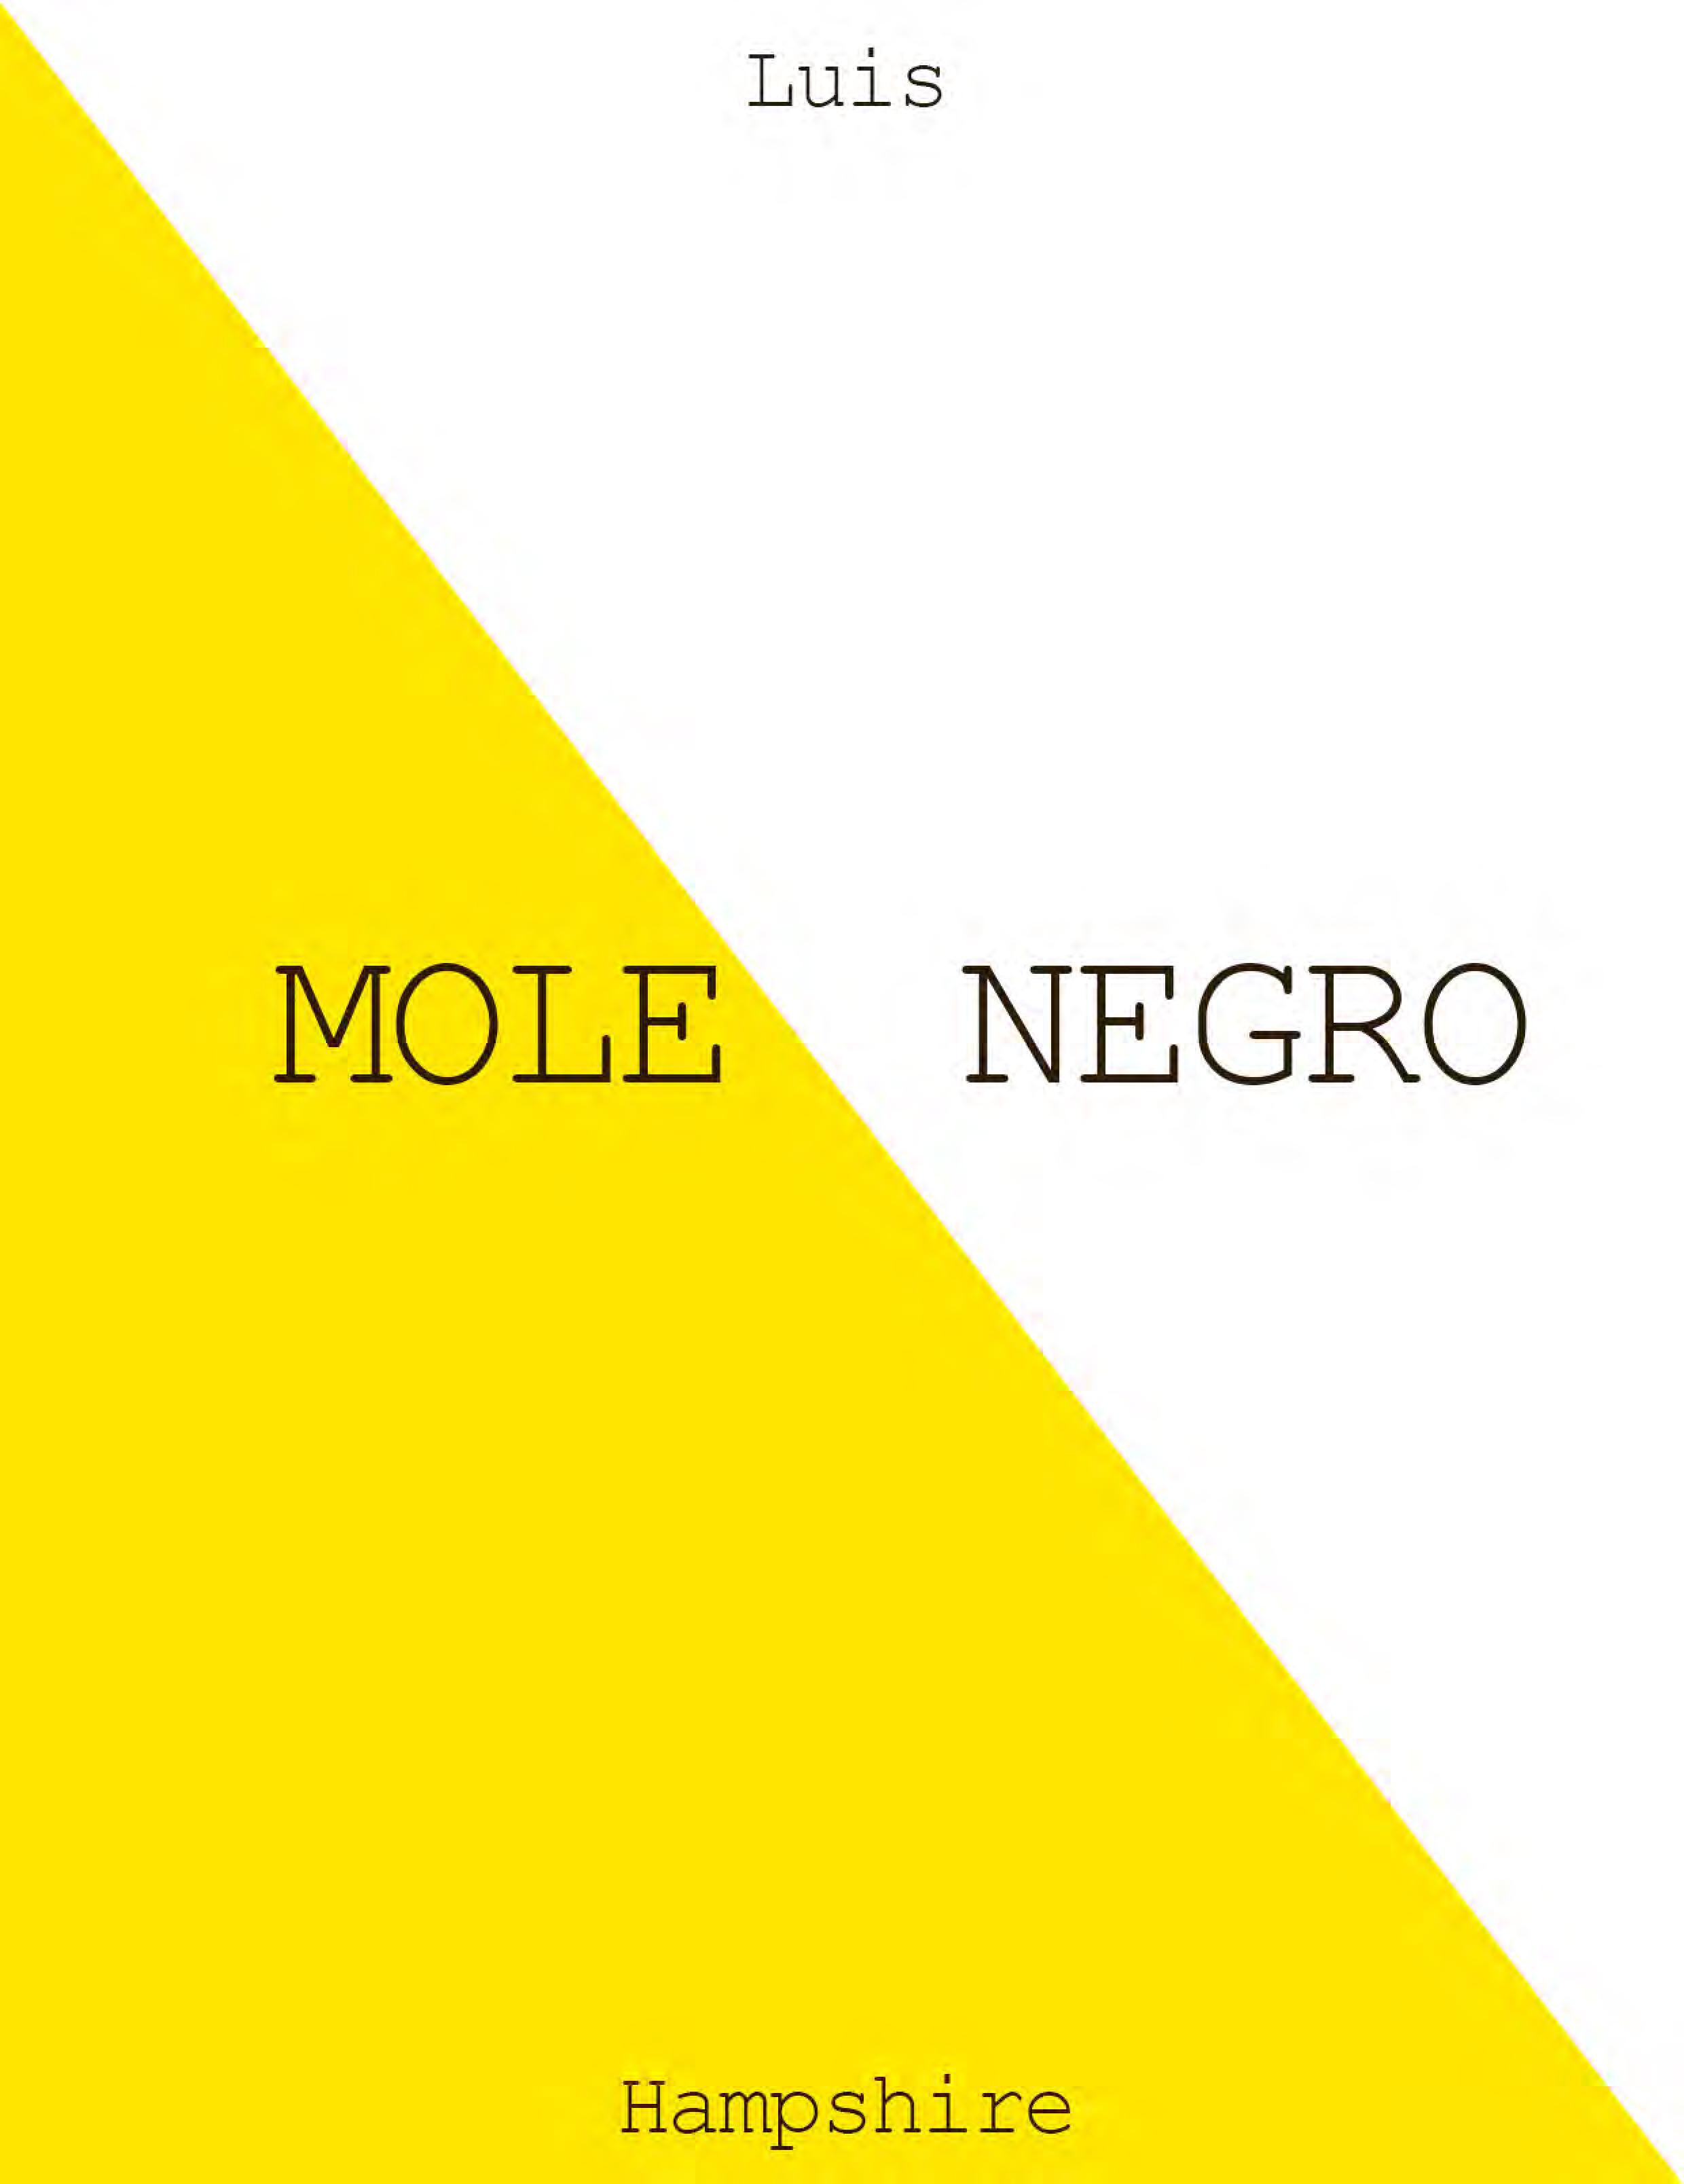 MOLE NEGRO-1.jpg